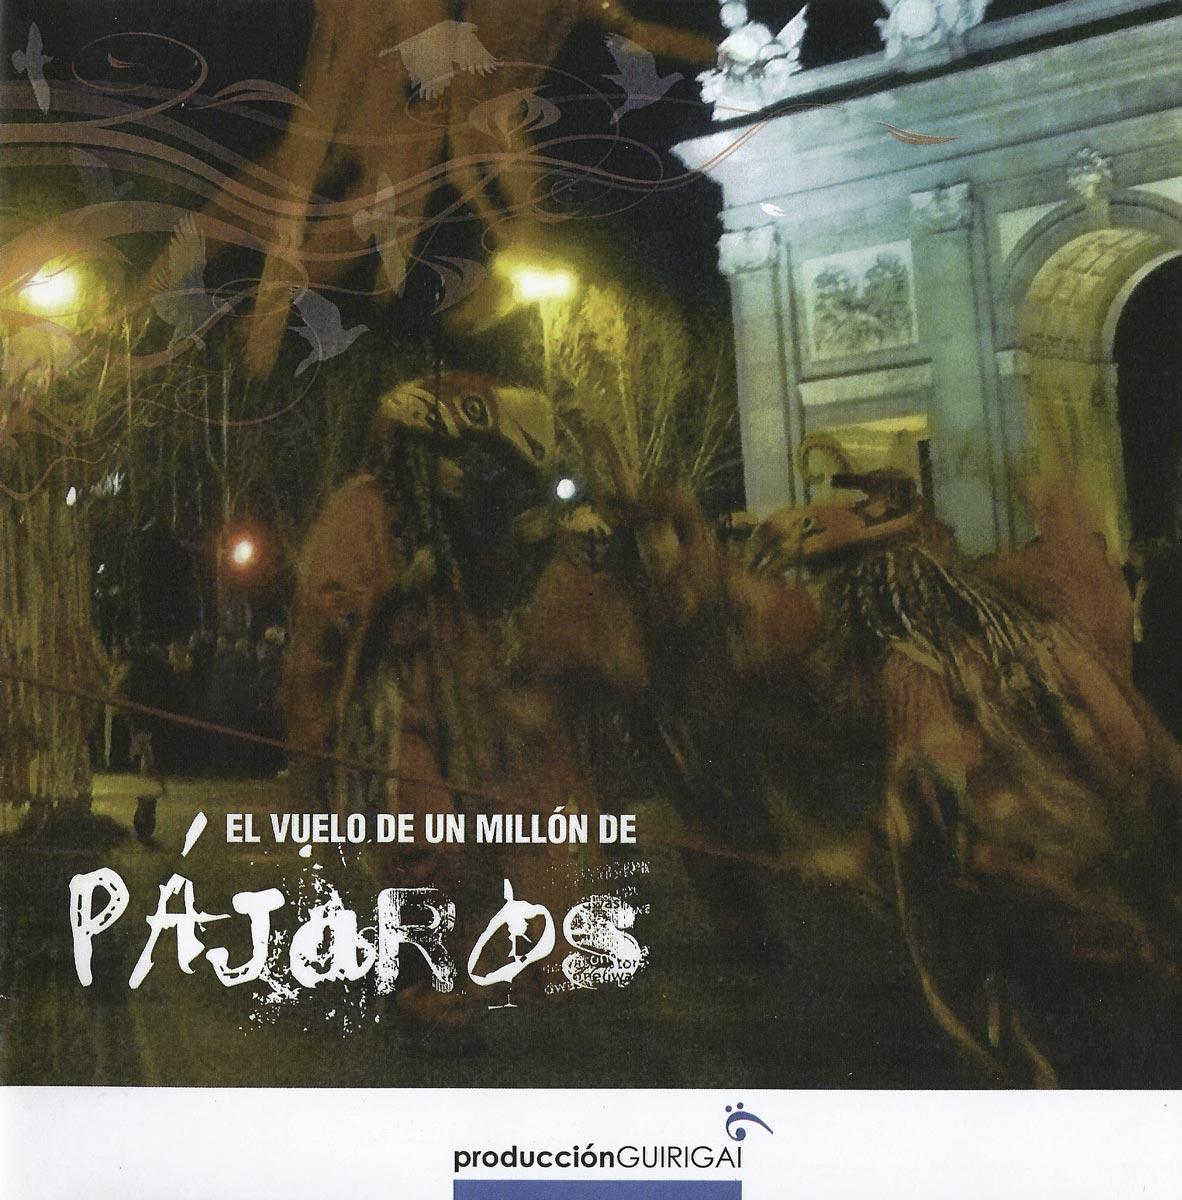 2007-vuelo-millon-pajaros-guirigai-cartel-0002